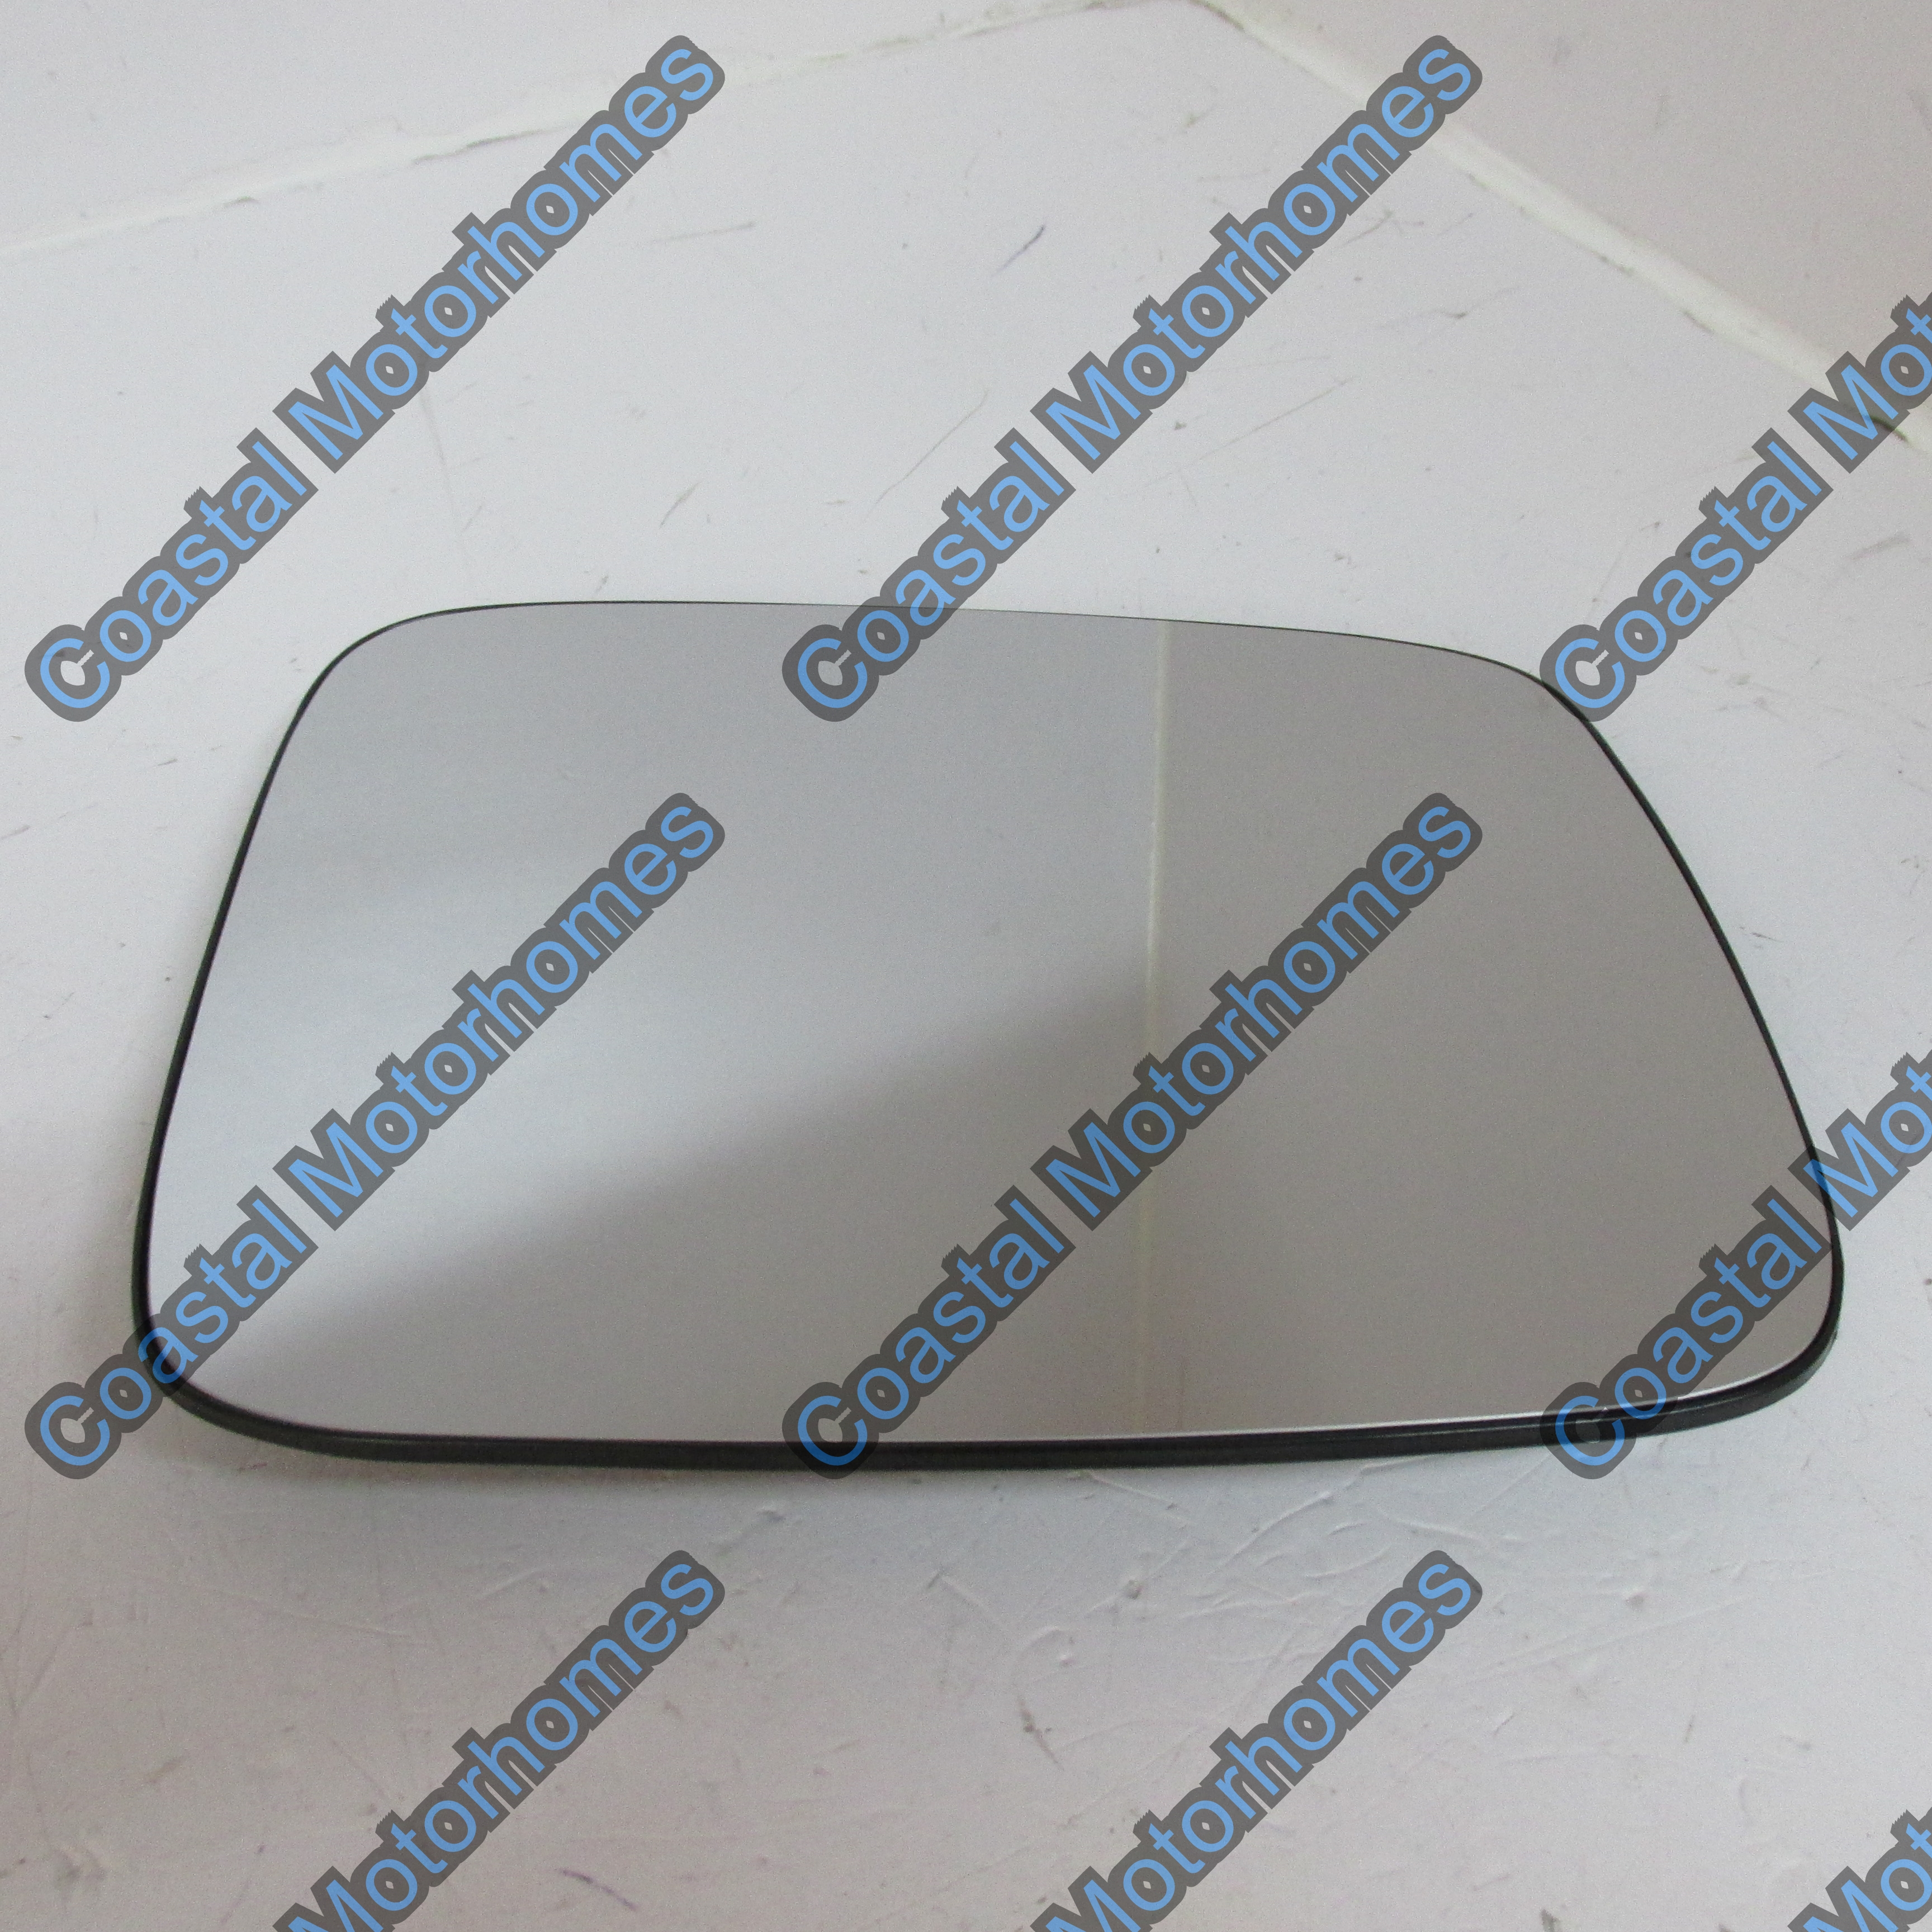 VW T4 TRANSPORTER// CARAVELLE DOOR WING MIRROR GLASS R//H